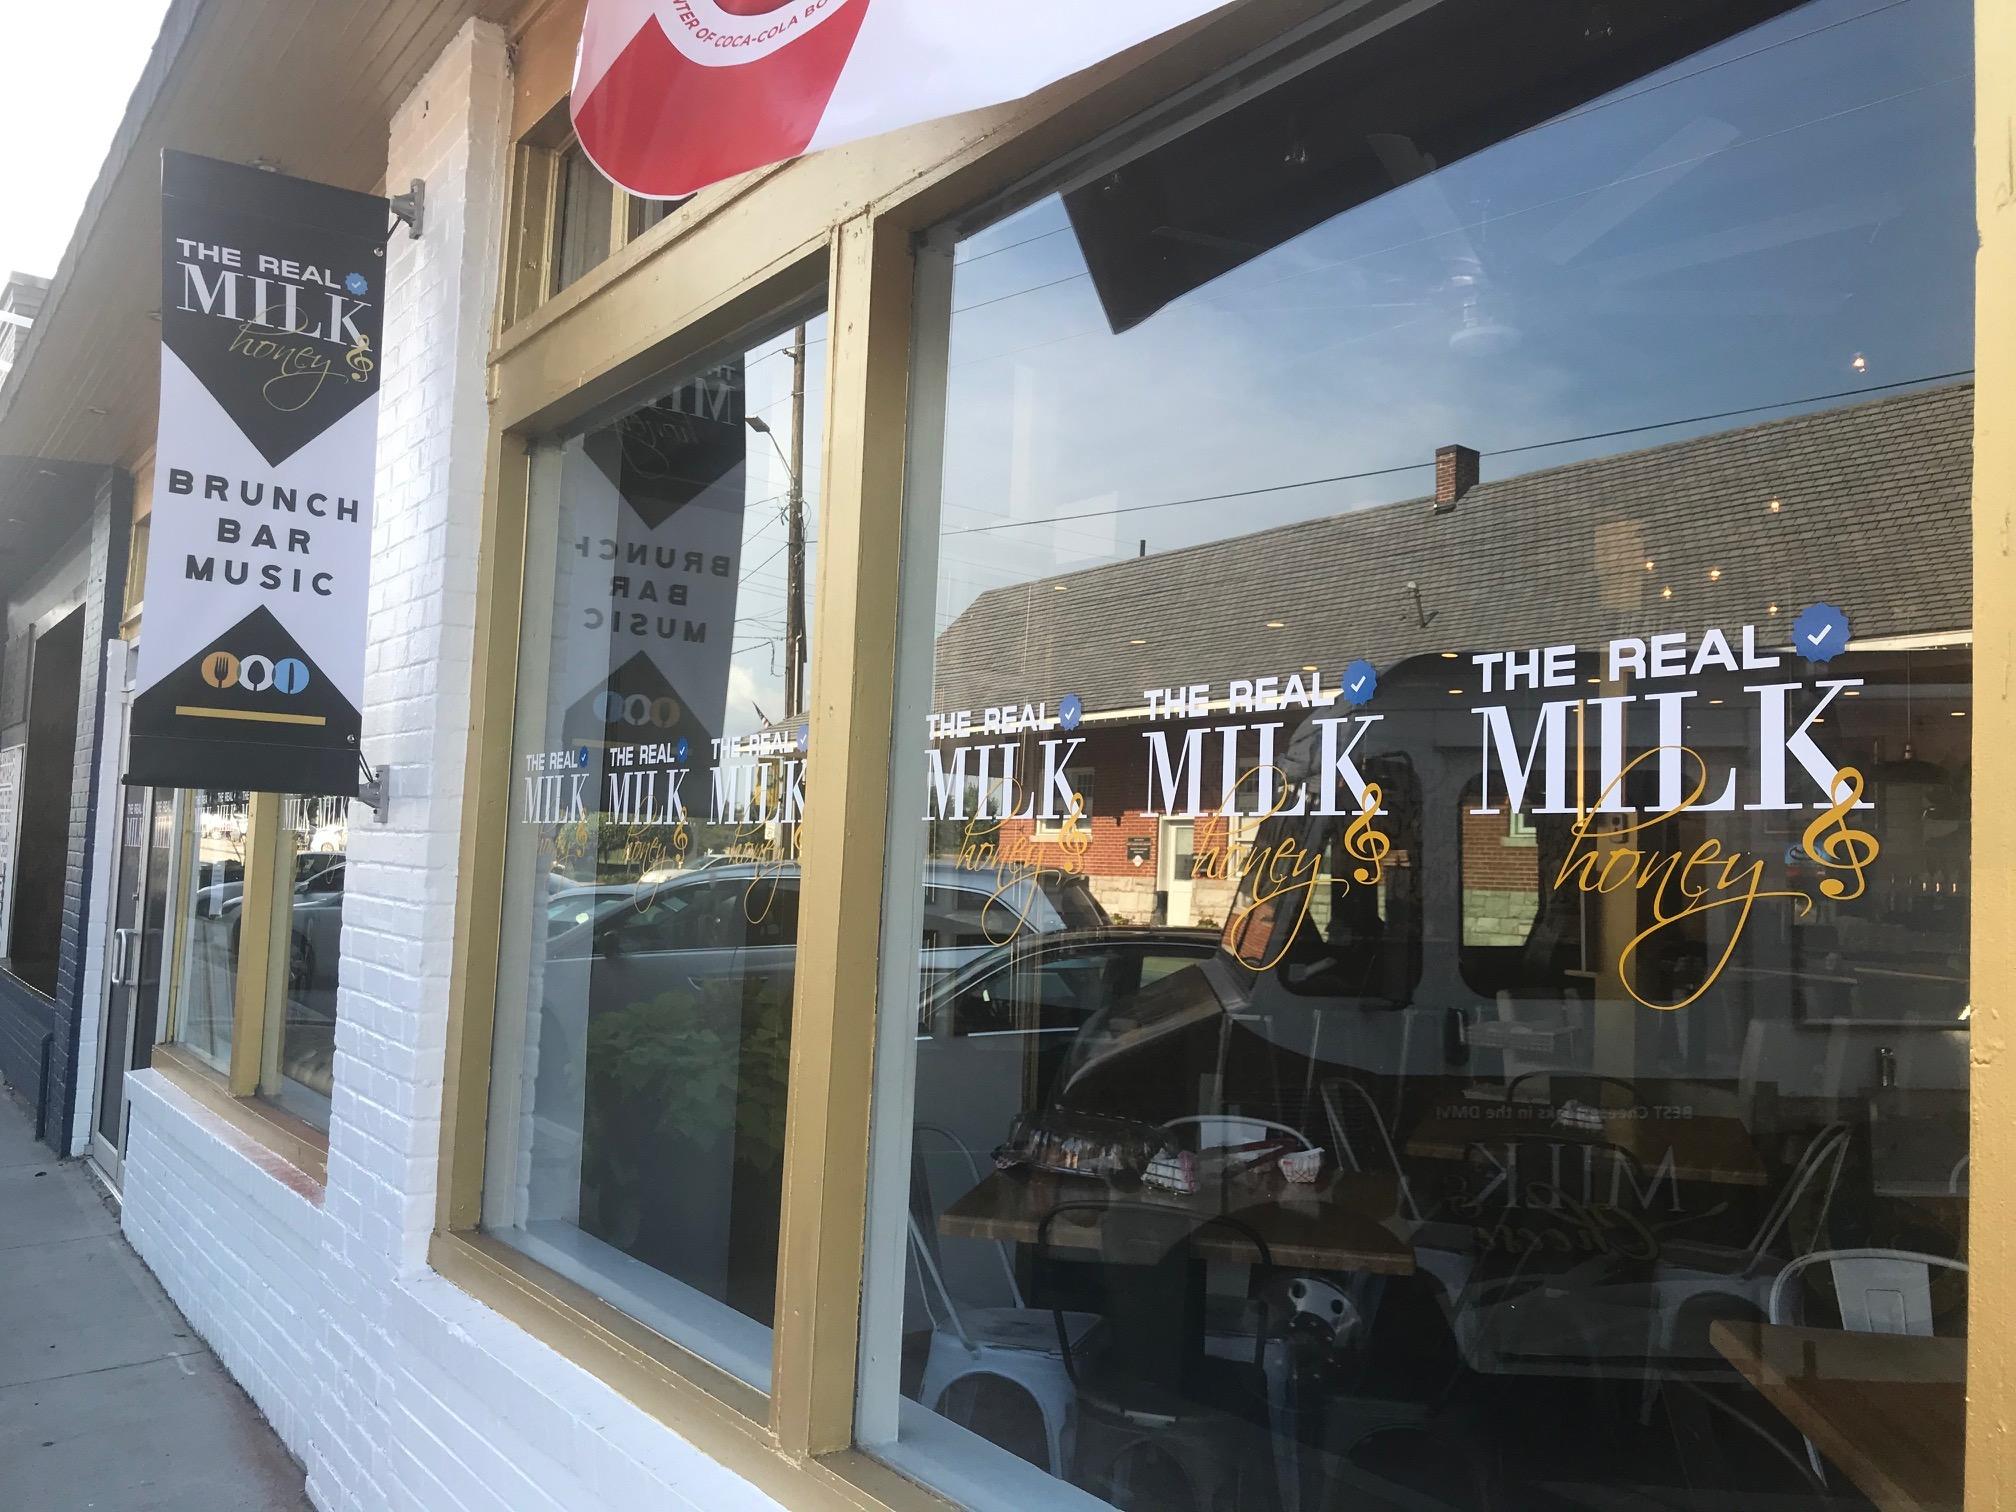 Chef Sammy Davis Jr. opens The Real Milk & Honey Cafe in College Park